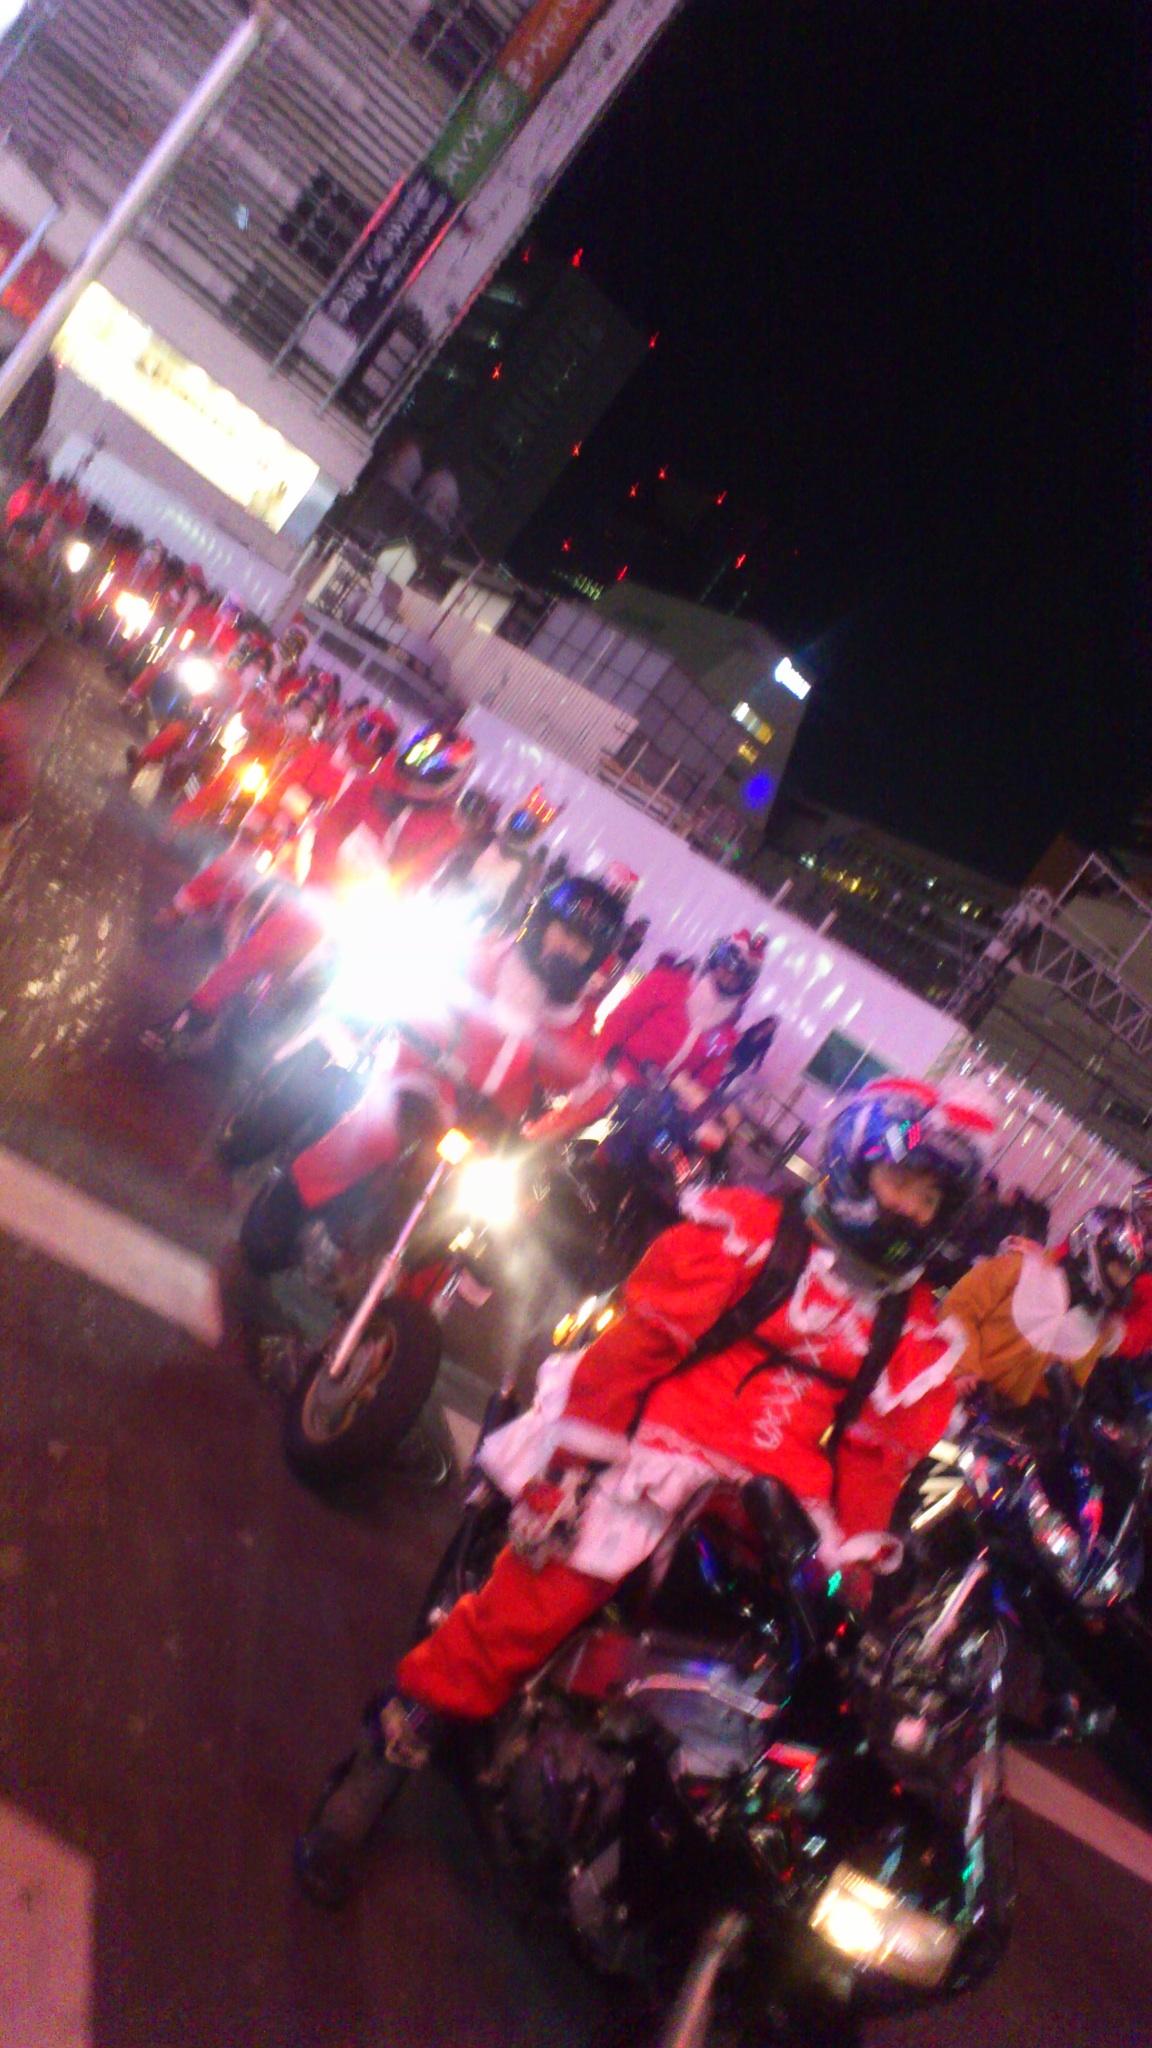 http://www.washin-optical.co.jp/blog/ladies/IMG_0968.jpg